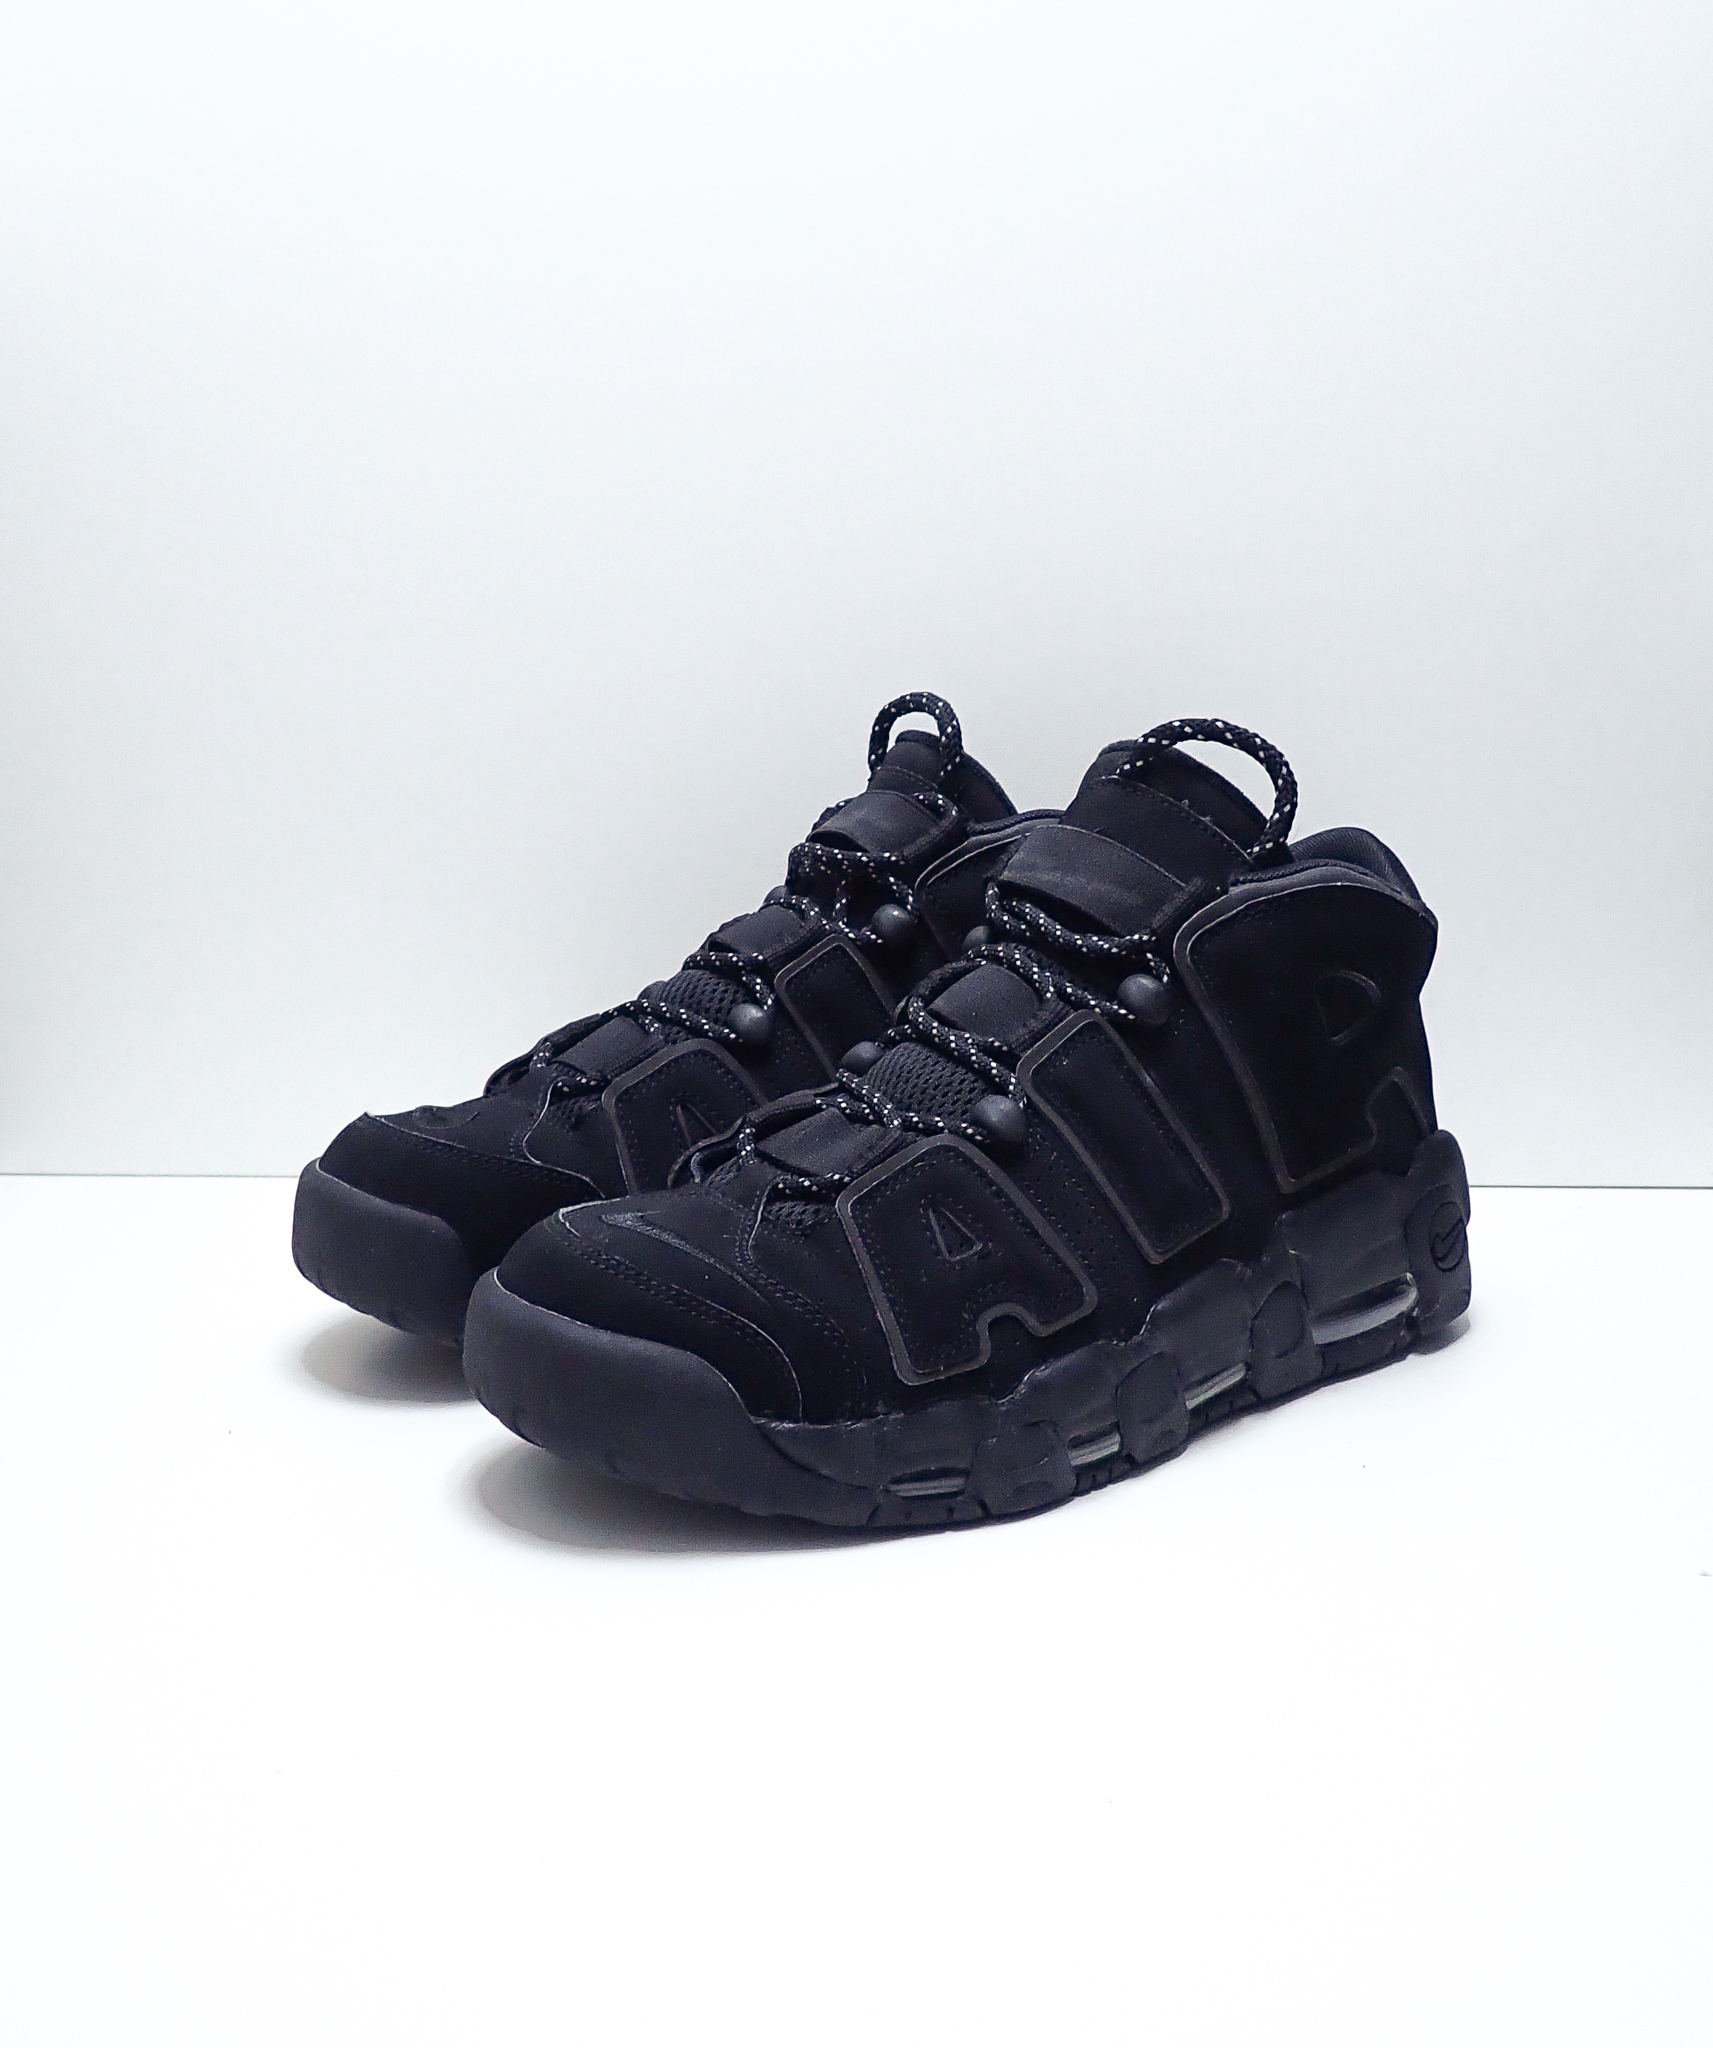 Nike Air More Uptempo Black Reflective (2018)